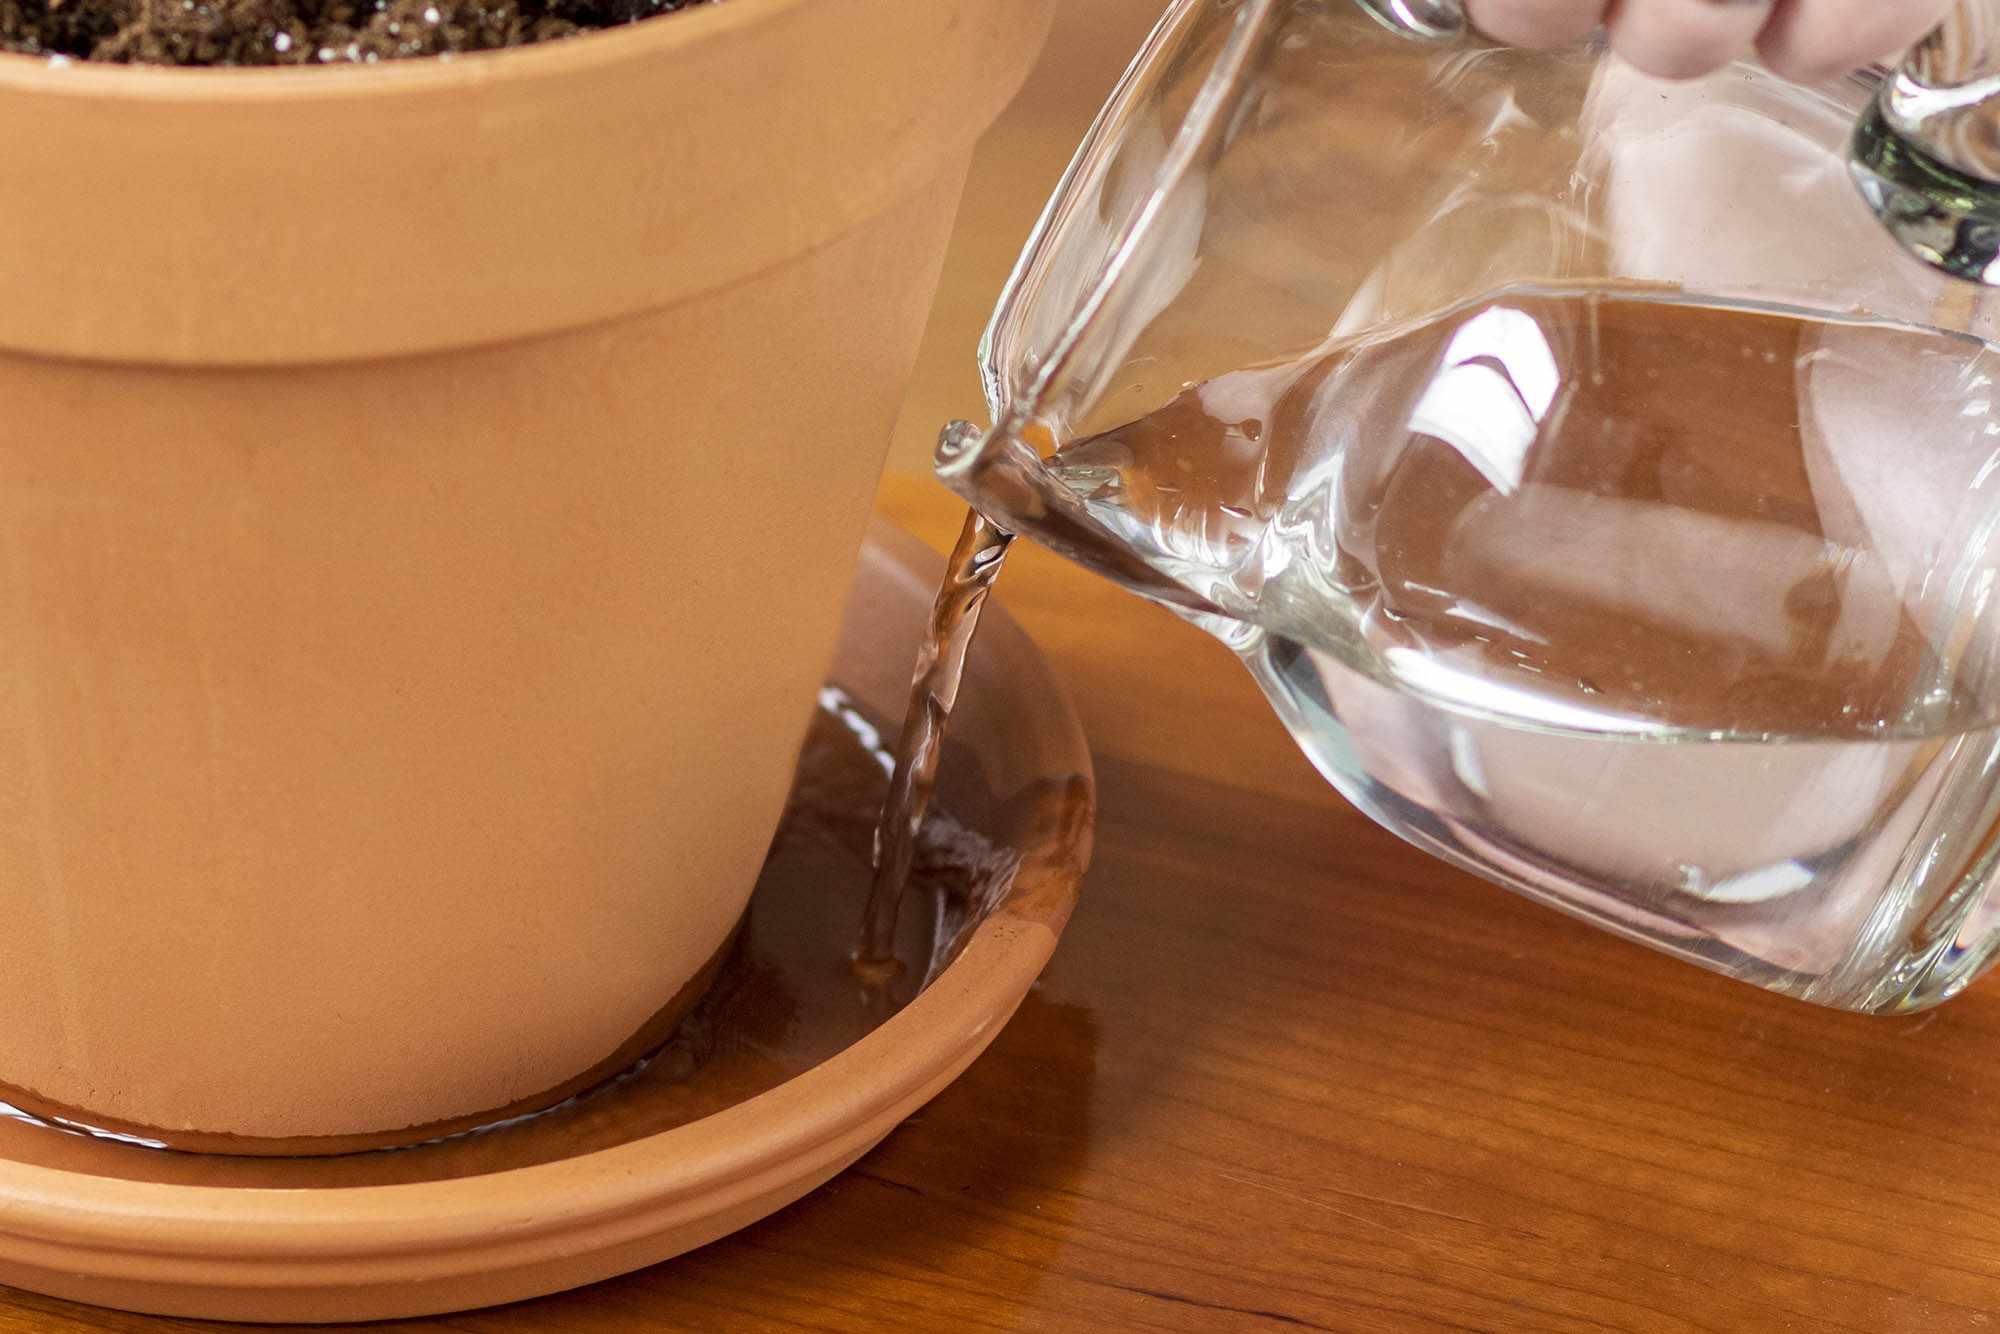 How to Water Houseplants Correctly